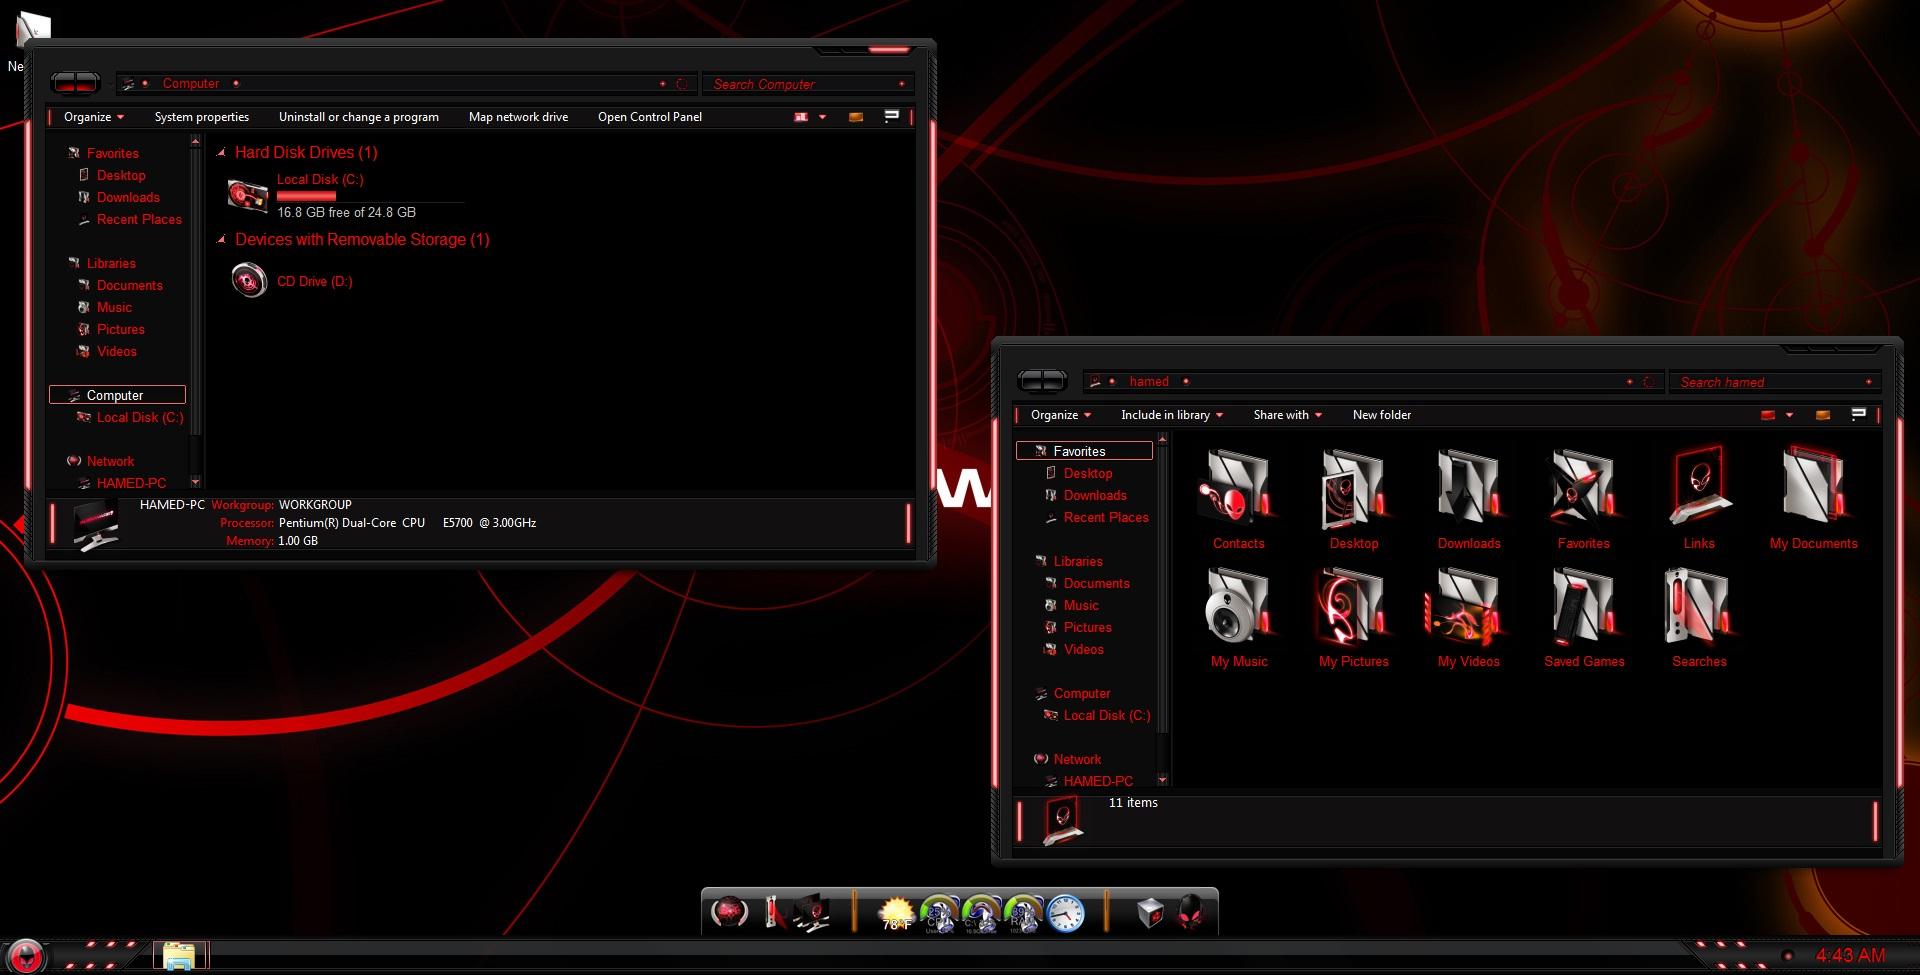 red alienware skin pack free download